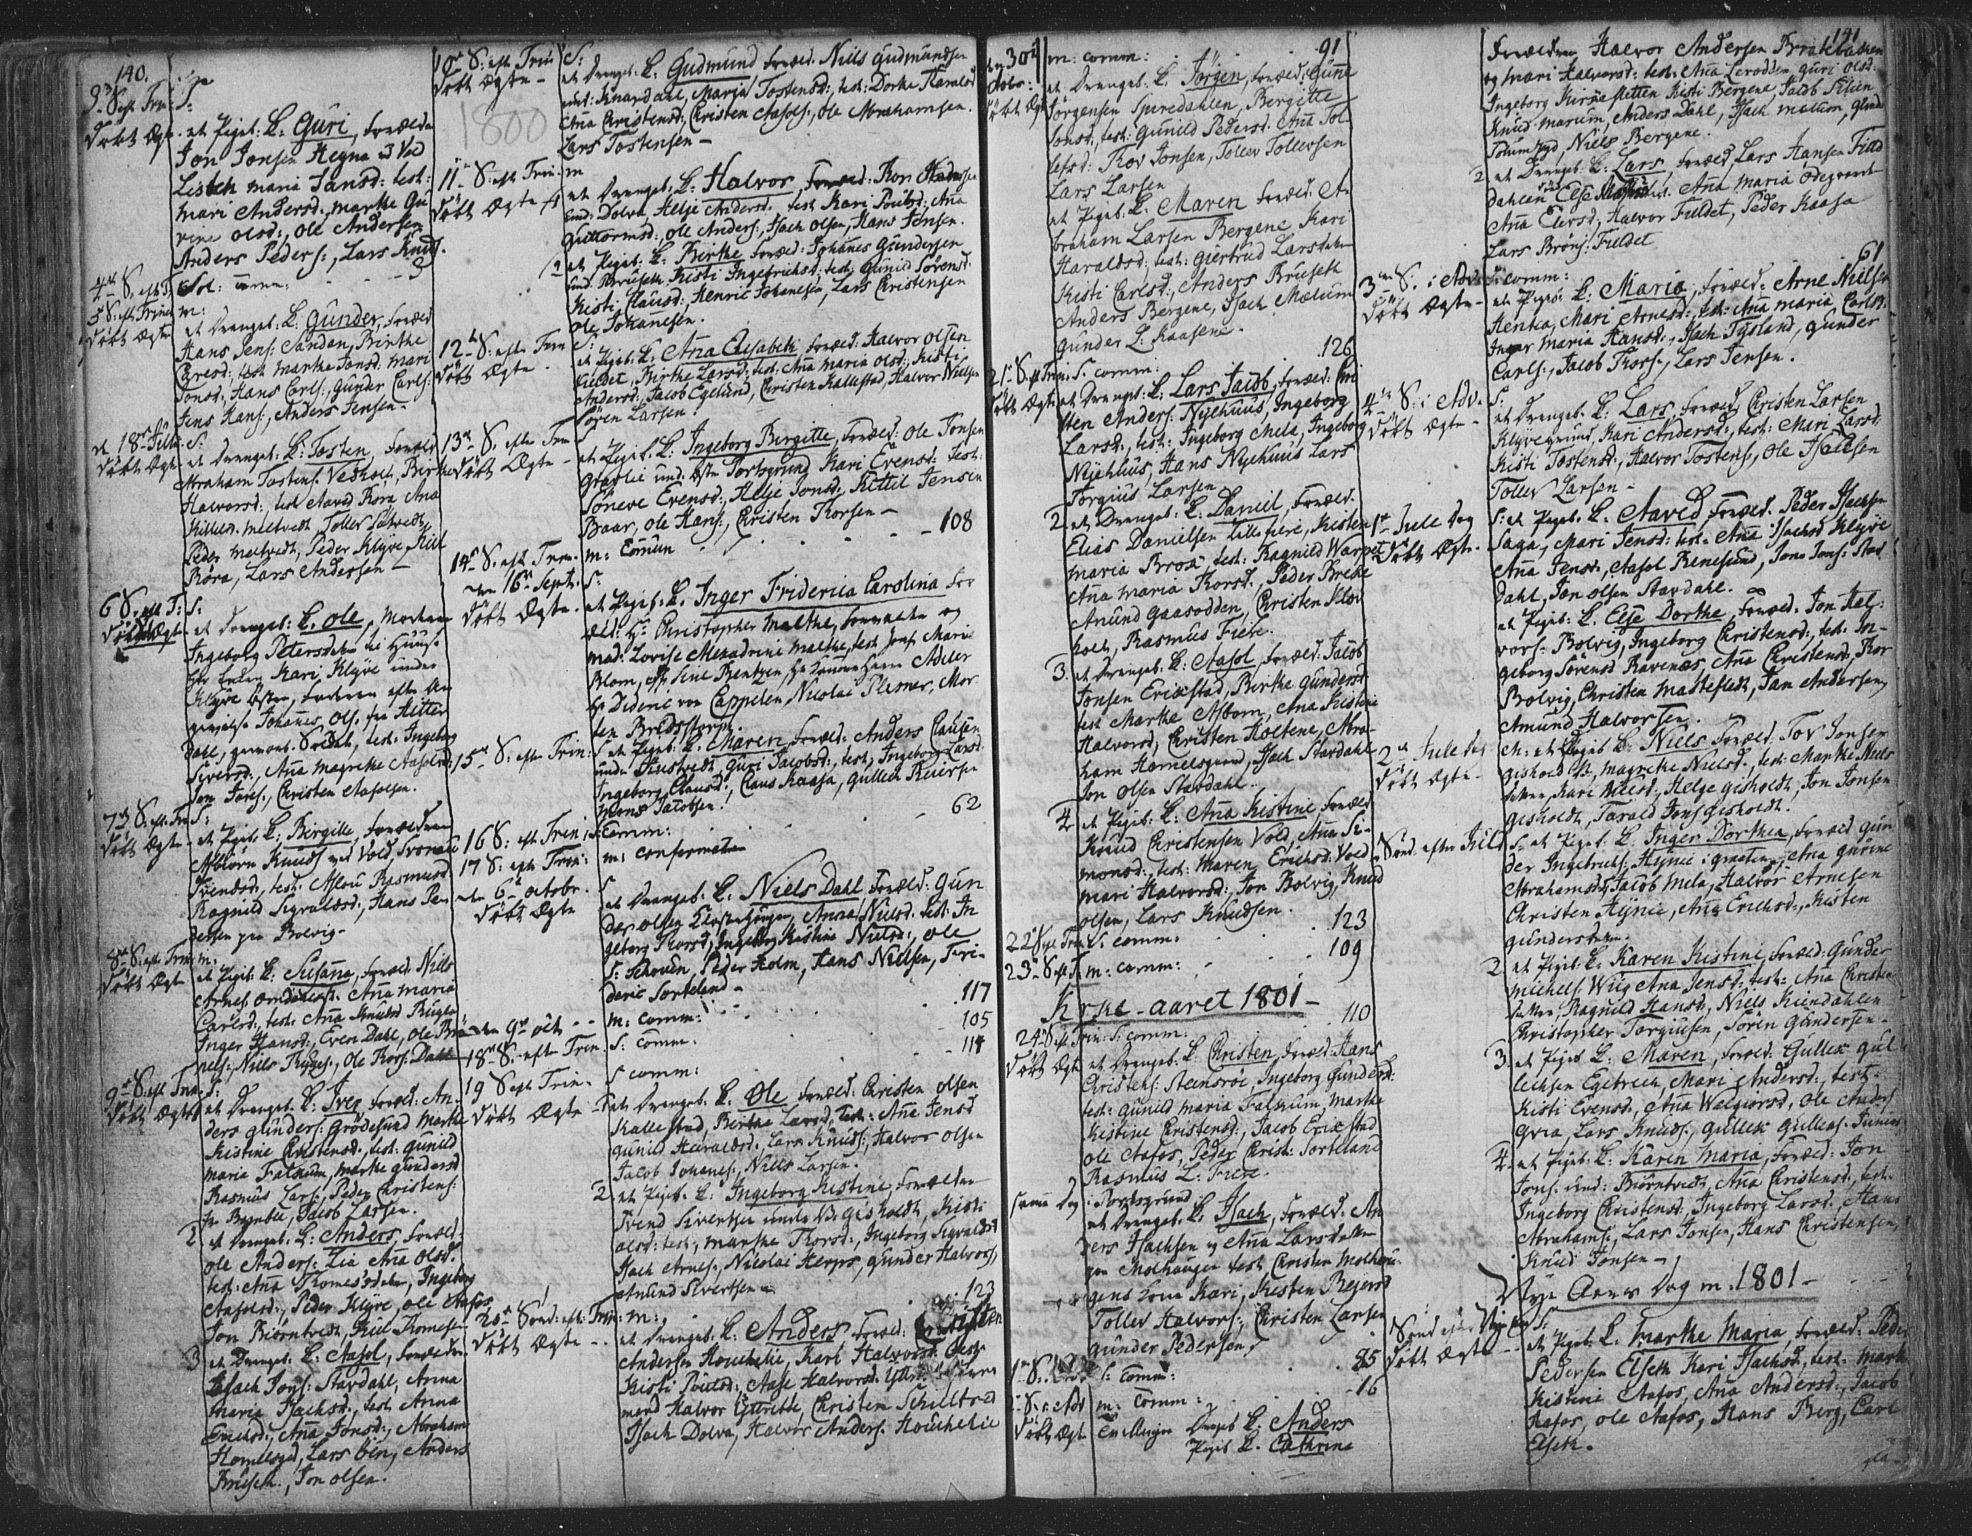 SAKO, Solum kirkebøker, F/Fa/L0003: Ministerialbok nr. I 3, 1761-1814, s. 140-141